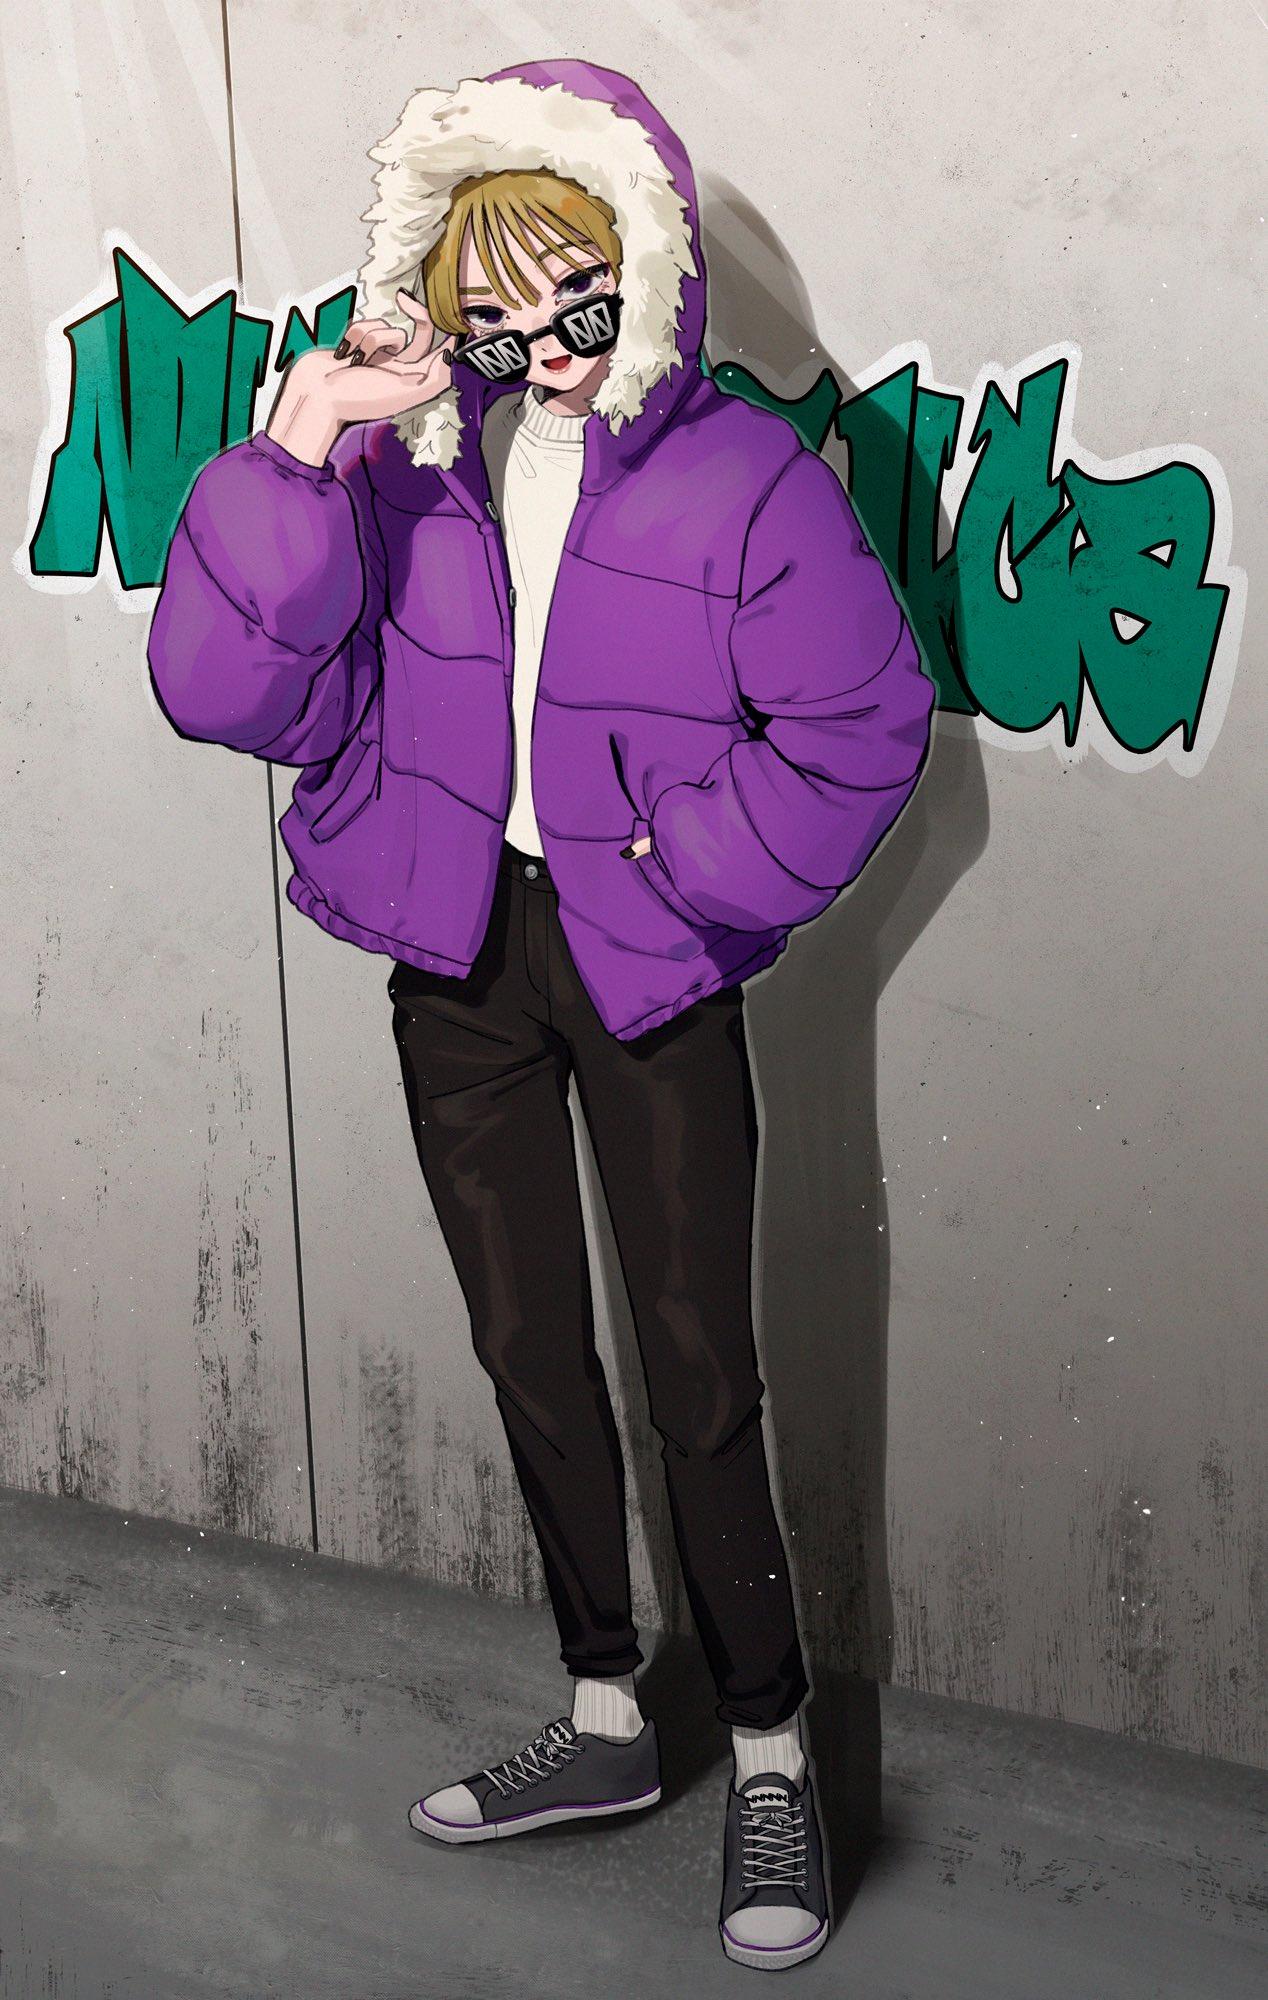 1girl adjusting_eyewear bangs black_eyes black_nails black_pants blonde_hair daikon_(tomohiro158) full_body fur_trim graffiti hand_in_pocket hand_up highres hood hood_up hooded_jacket jacket long_sleeves looking_at_viewer nail_polish open_mouth original pants puffy_long_sleeves puffy_sleeves purple_coat shadow shirt shirt_tucked_in shoes socks solo standing sunglasses white_legwear white_shirt